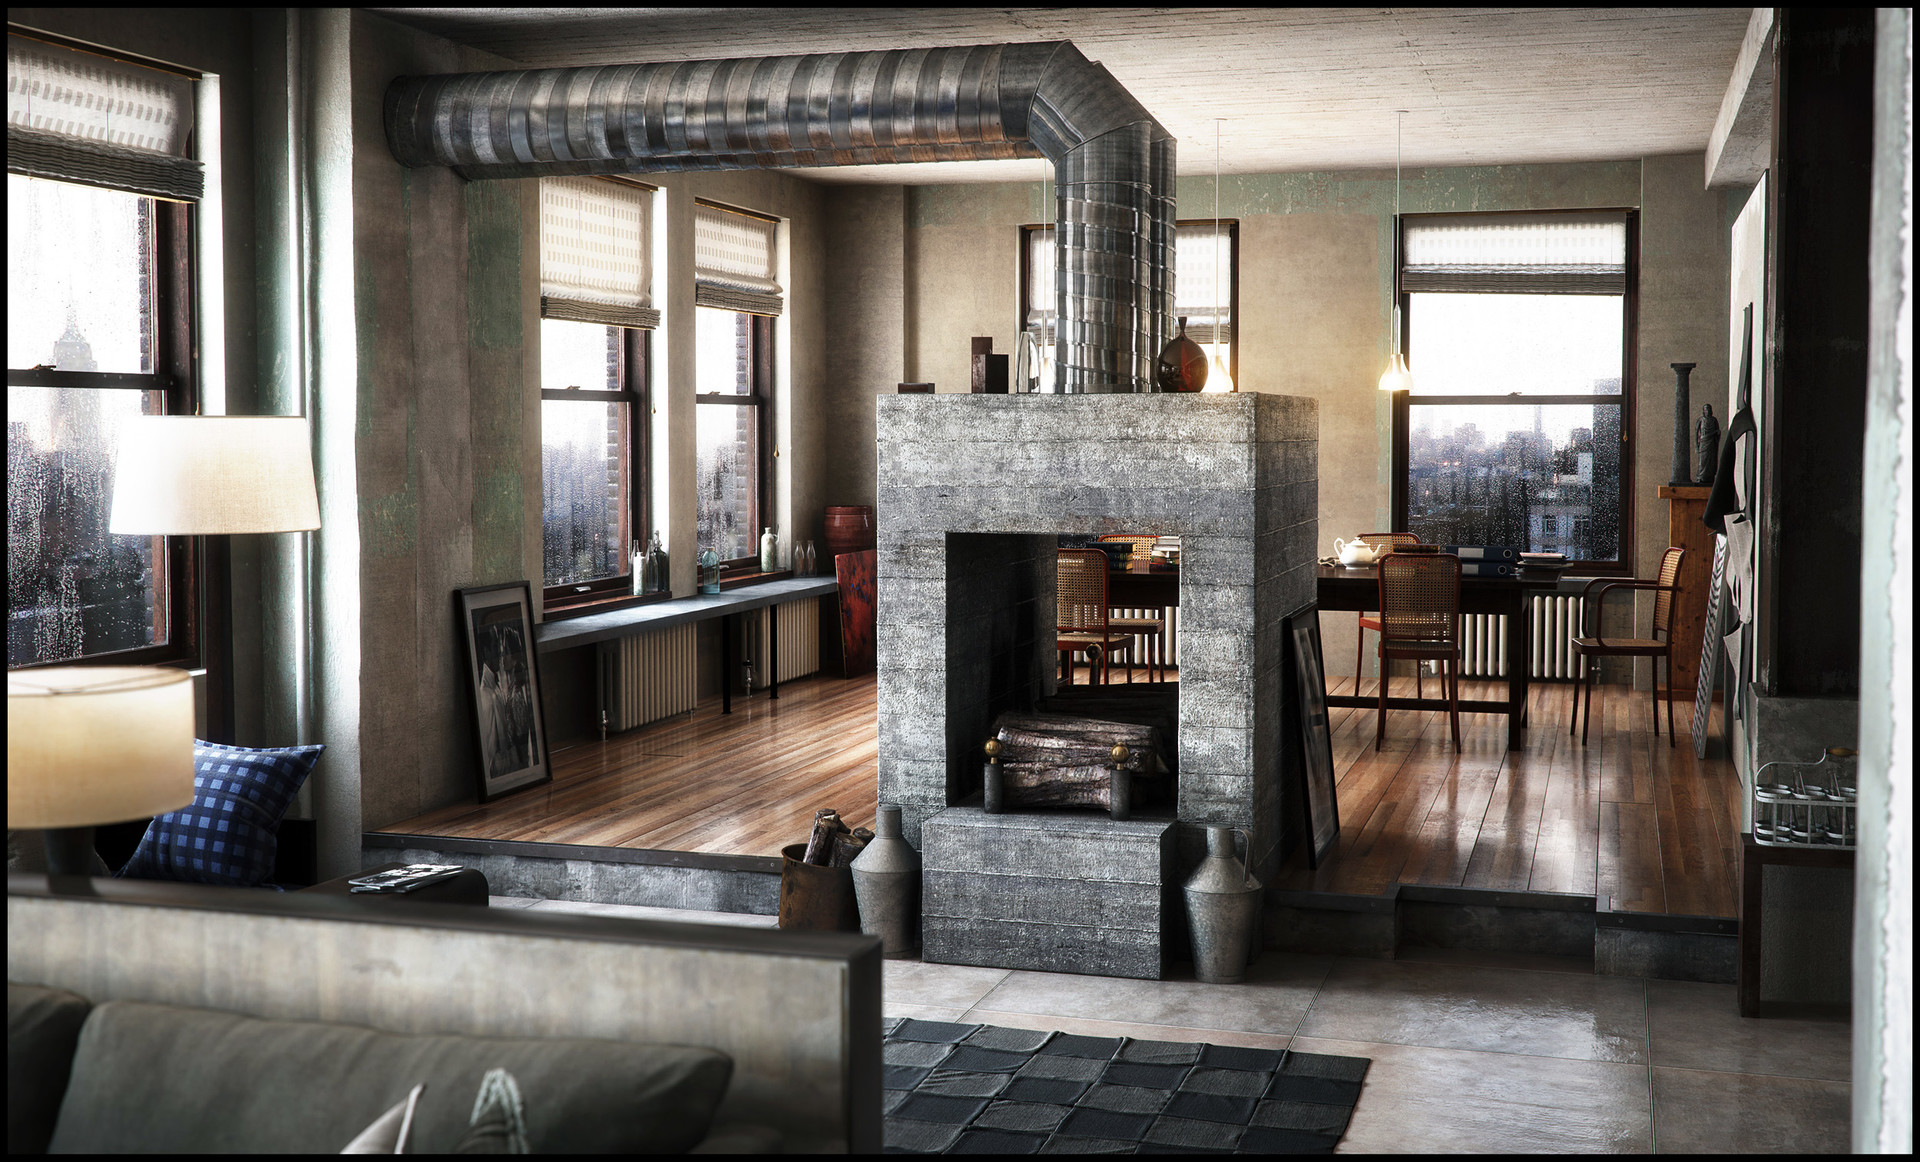 artstation - new york apartment, dennis iversholt